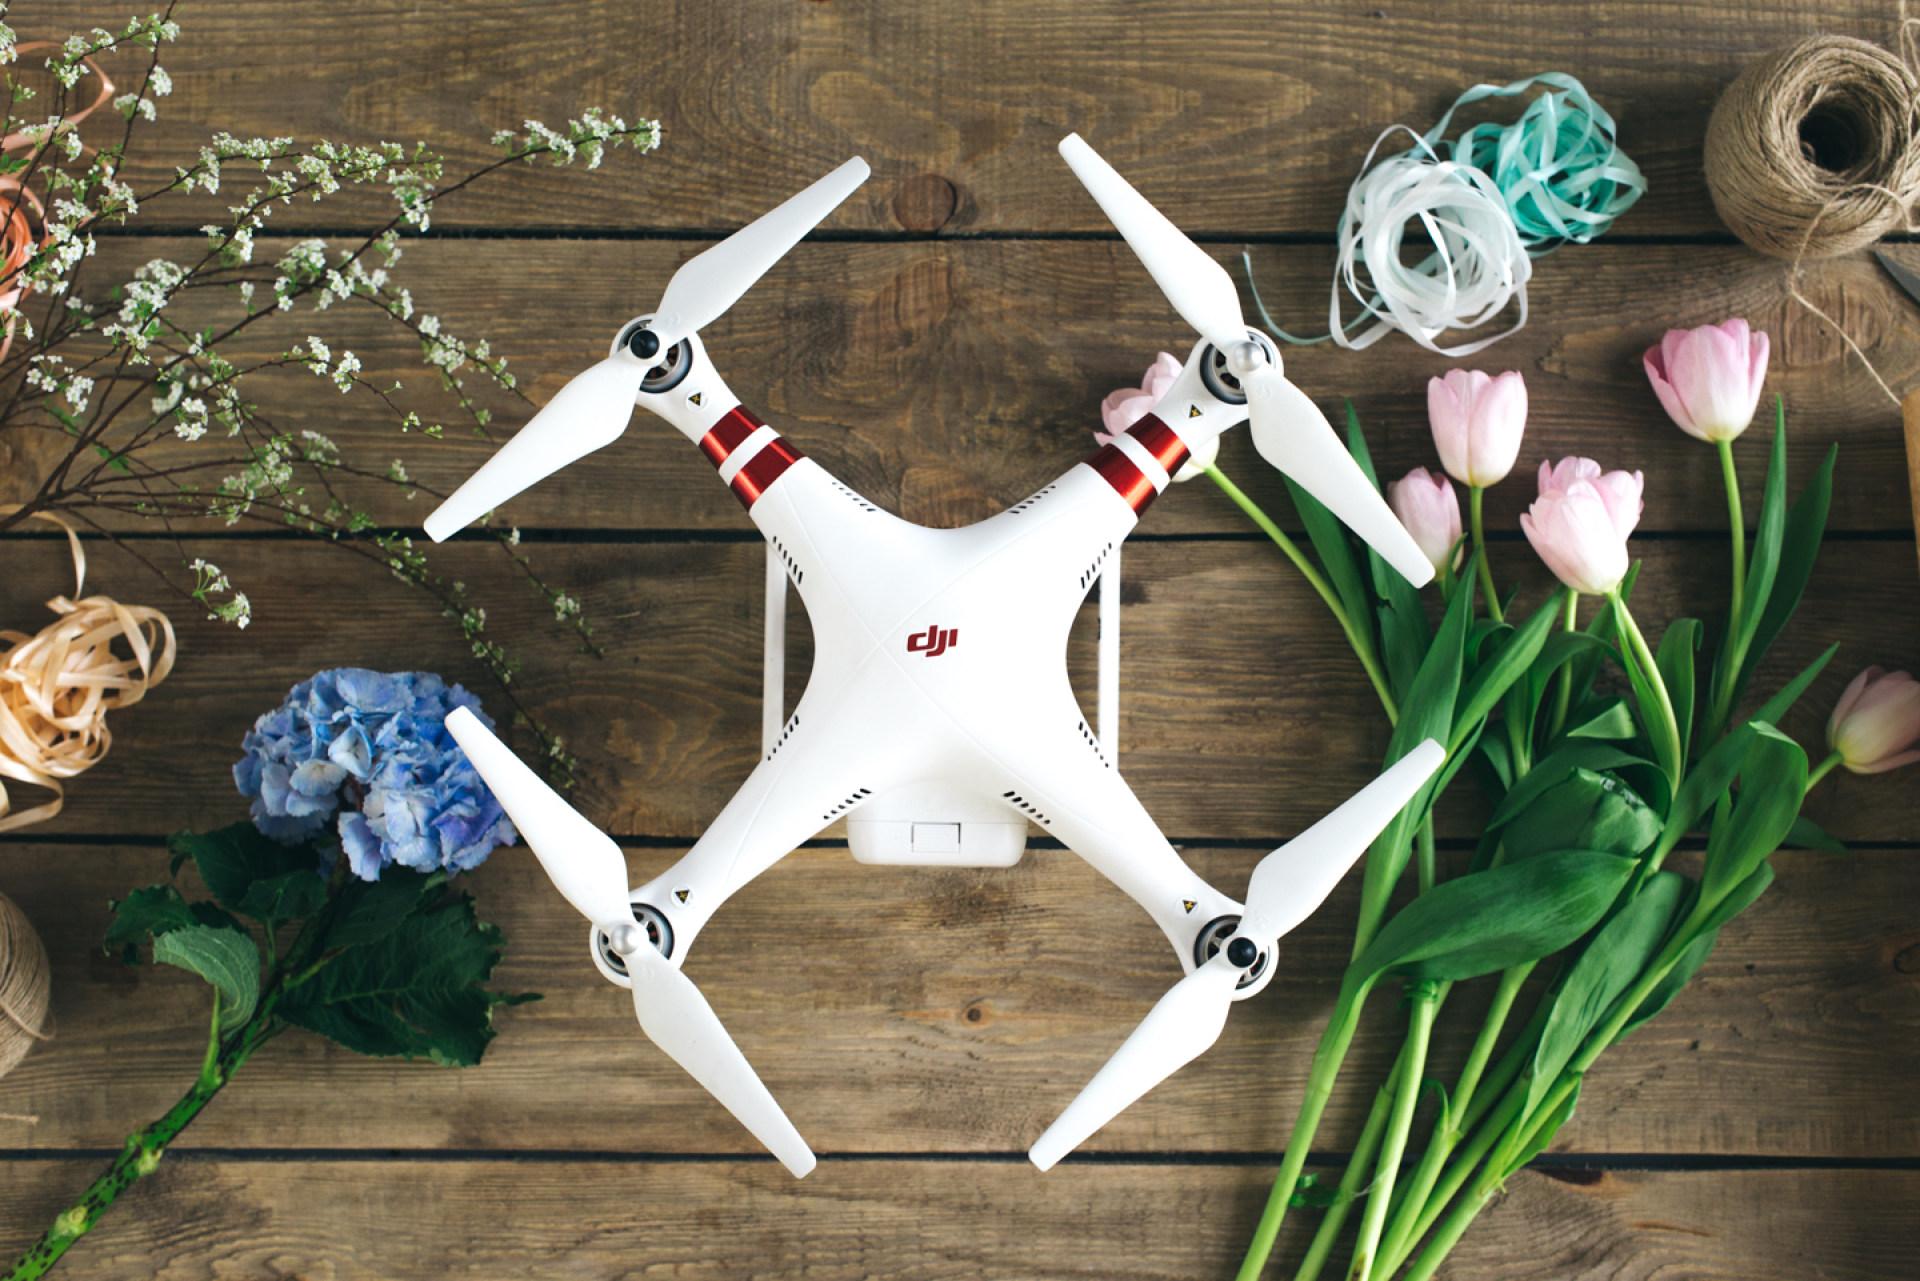 foto-primavera-drone-dji-1